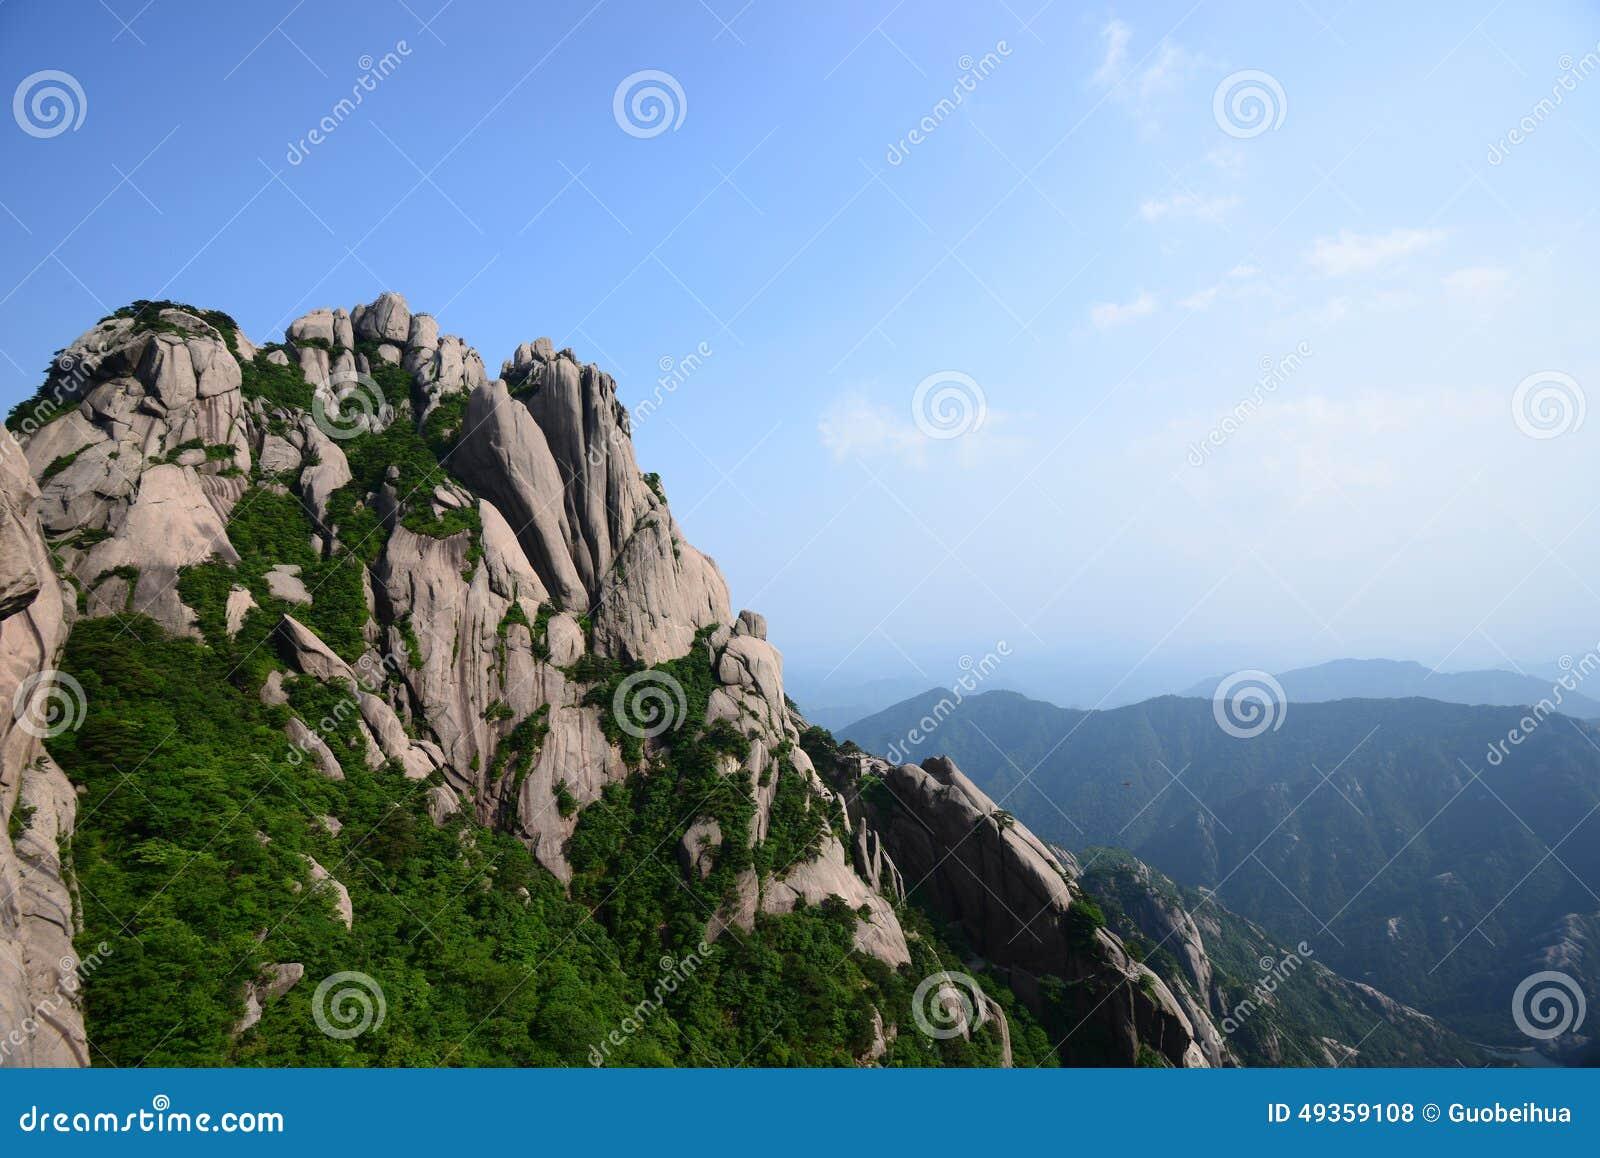 Huangshan, a mountain range in South Eastern China.